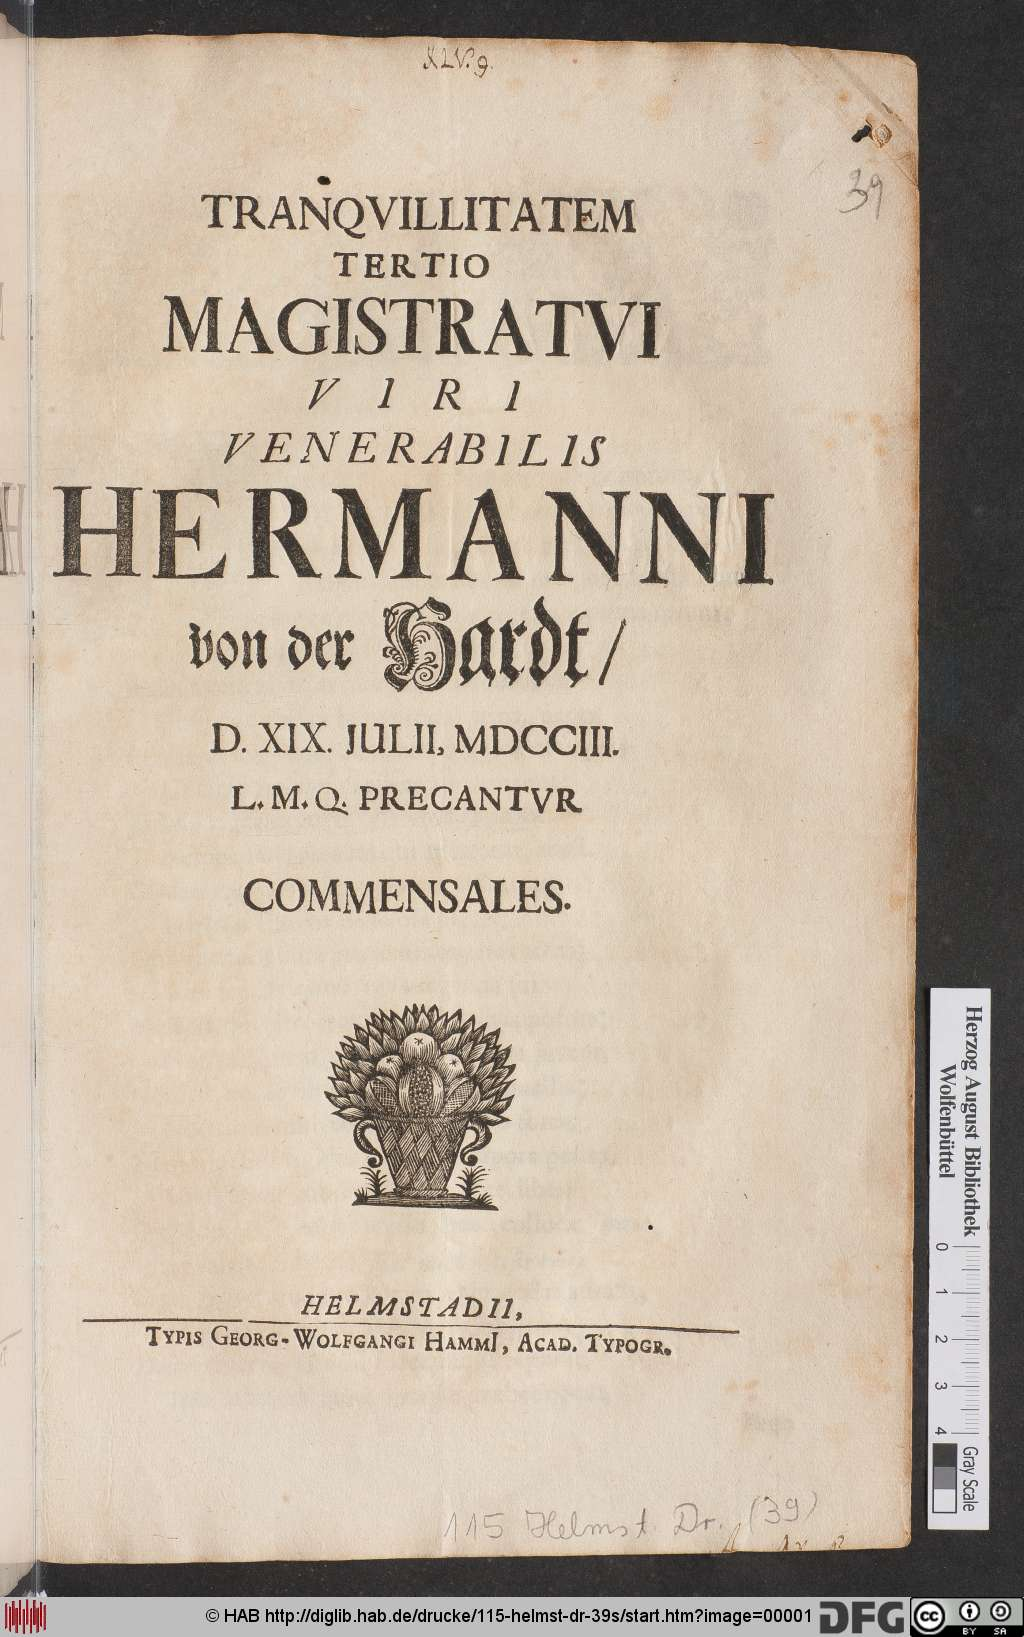 http://diglib.hab.de/drucke/115-helmst-dr-39s/00001.jpg